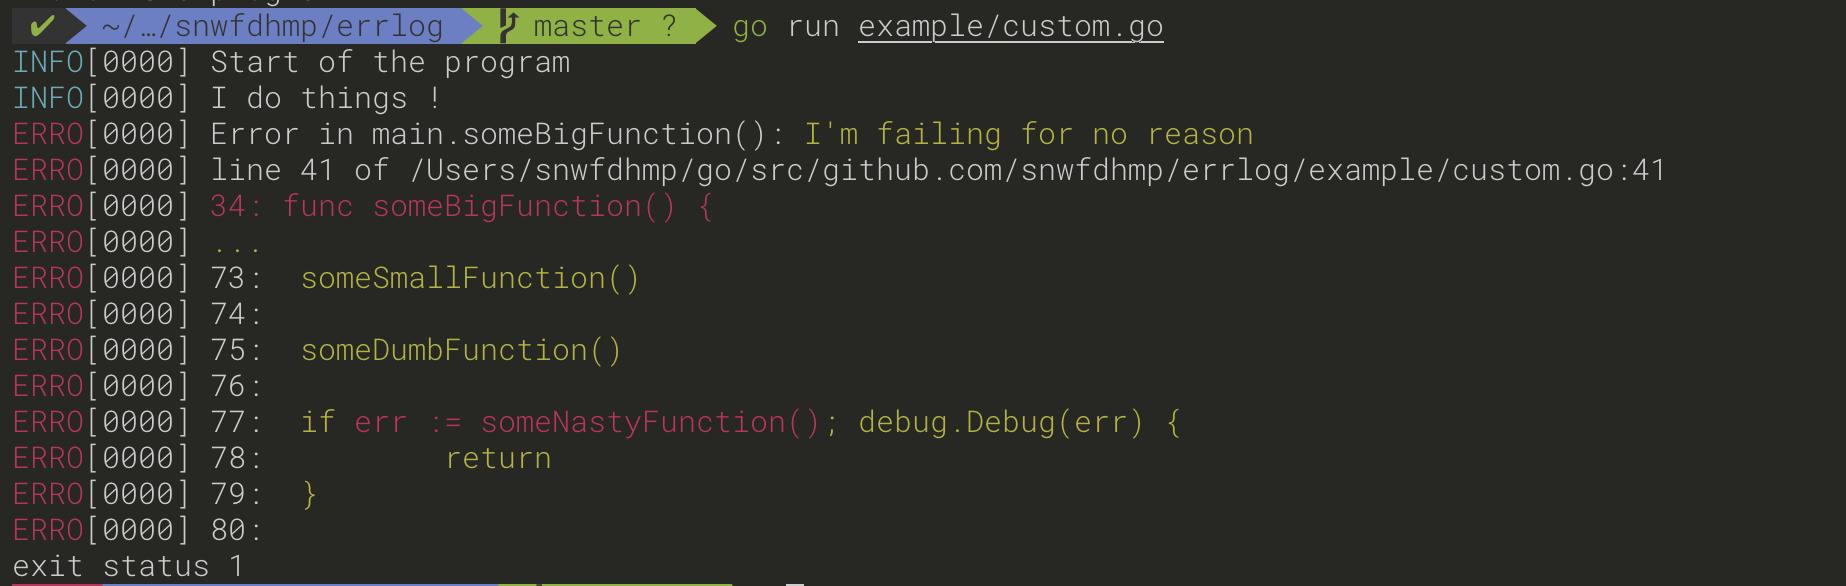 Console Output examples/custom.go